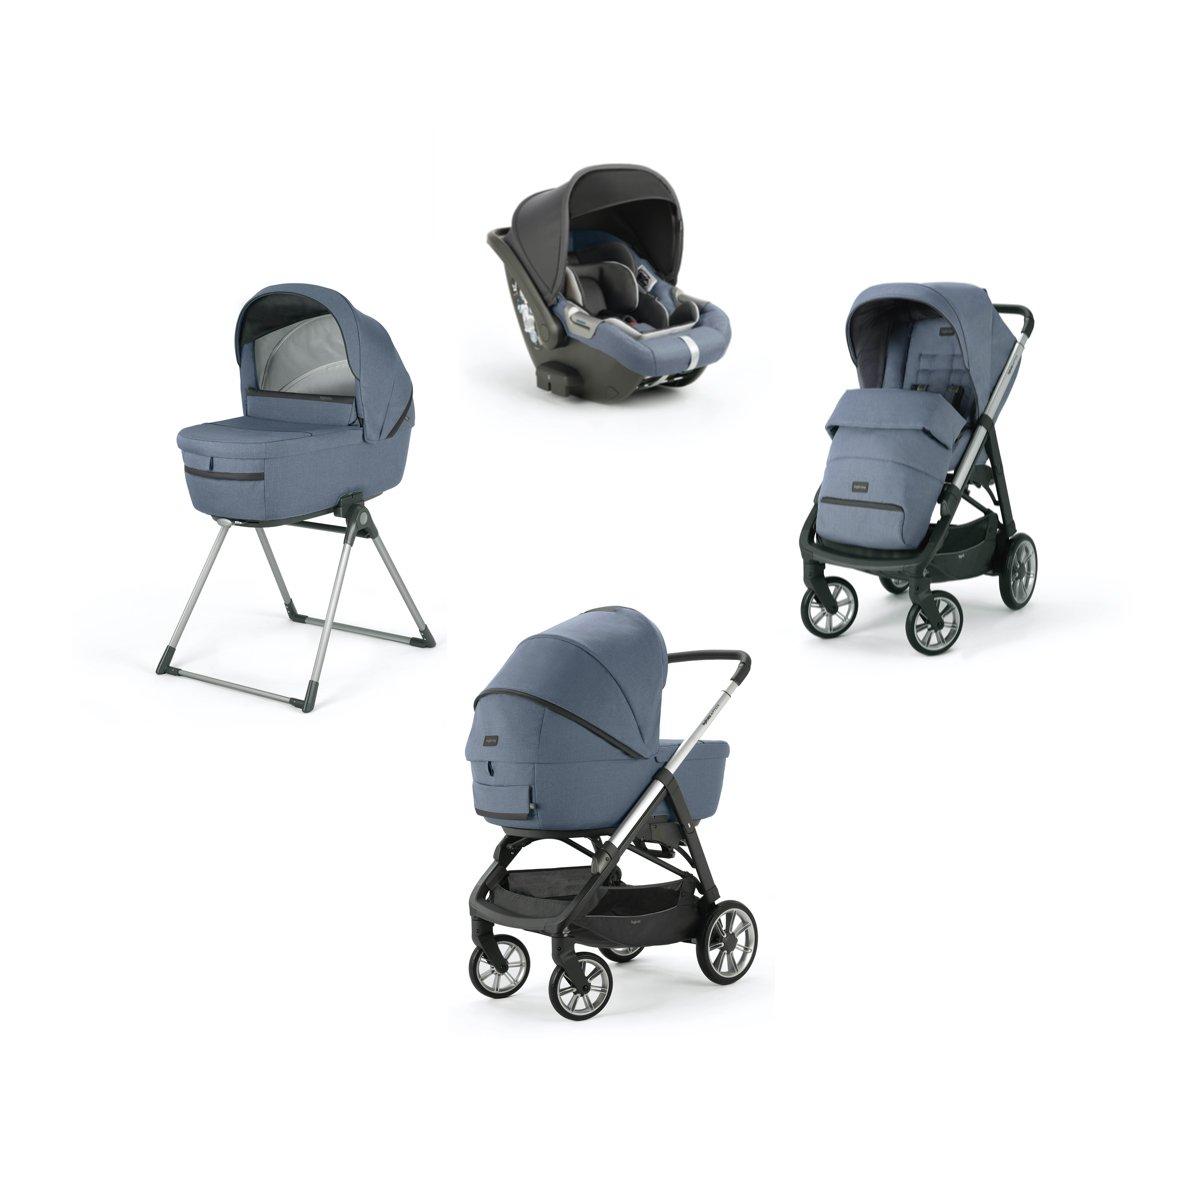 20++ Inglesina aptica stroller price ideas